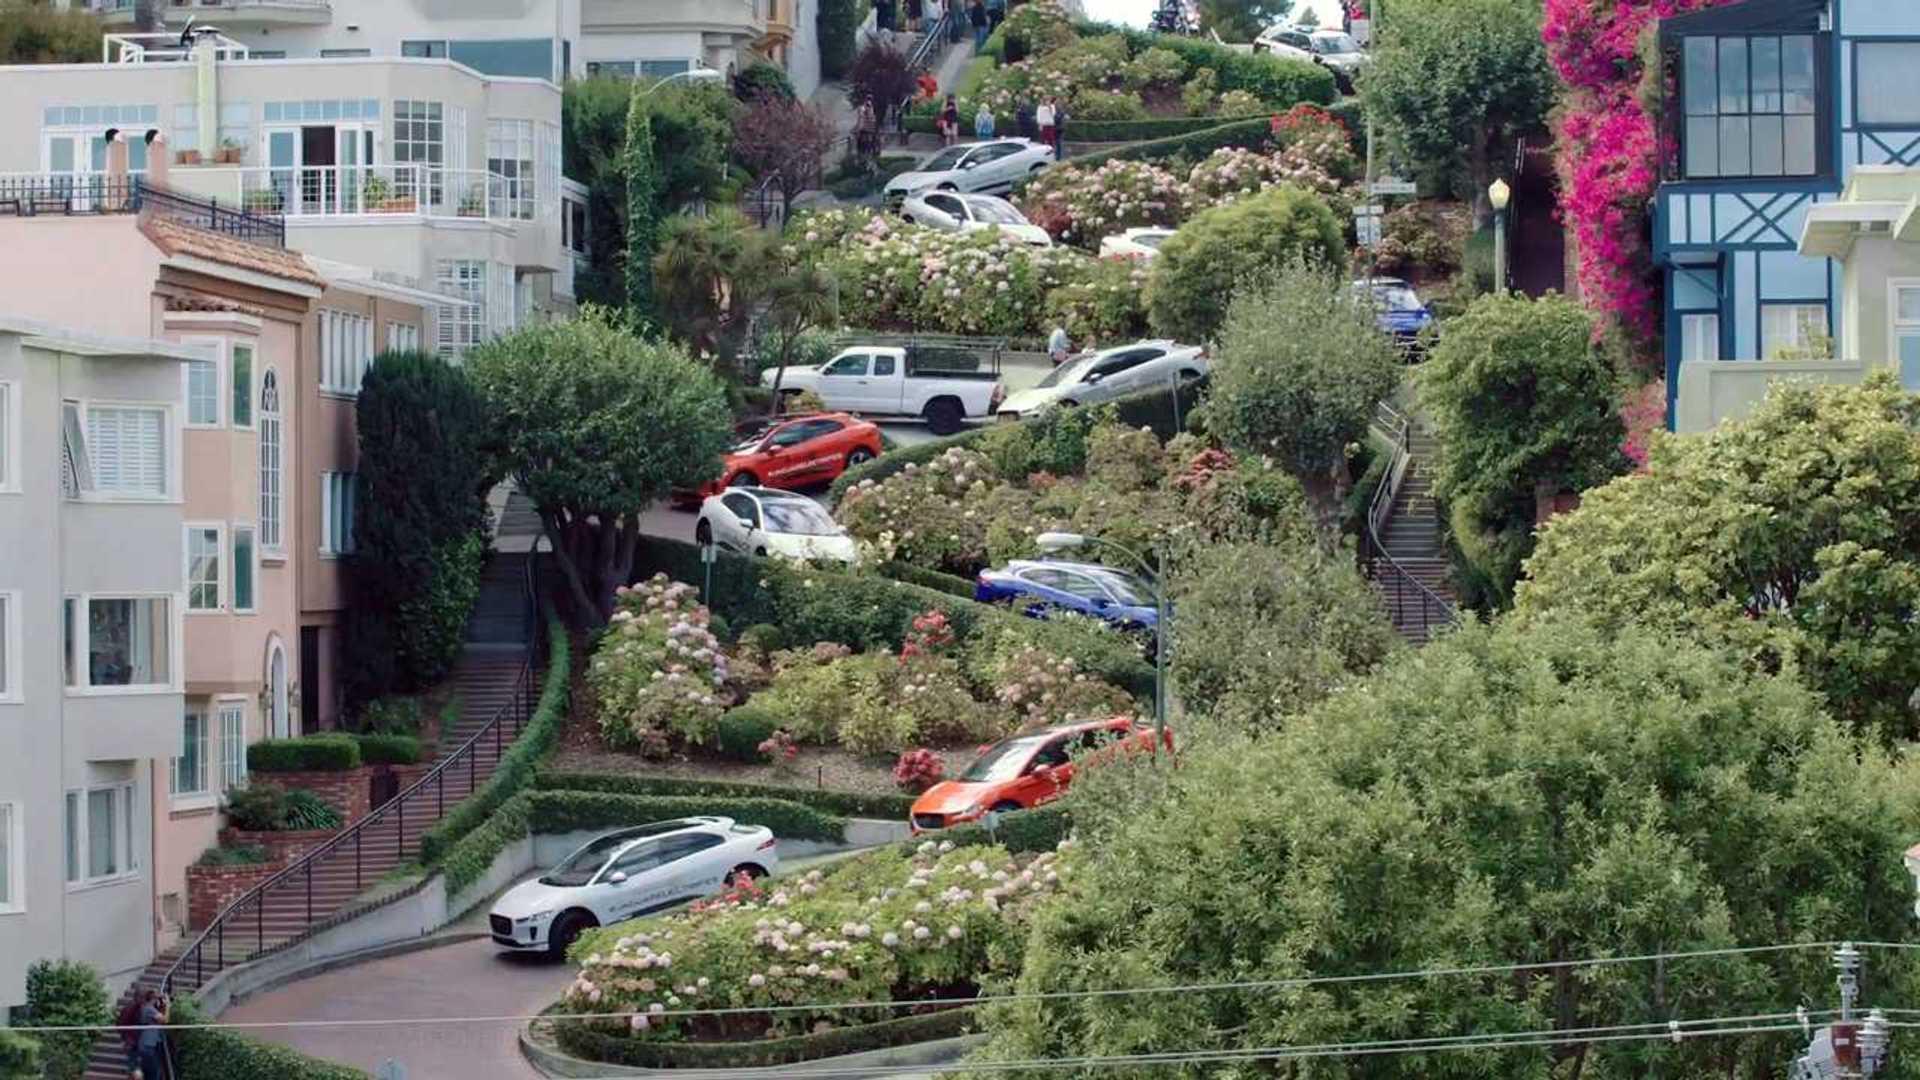 San Francisco Decides To Have Emission-Free Transportation By 2040